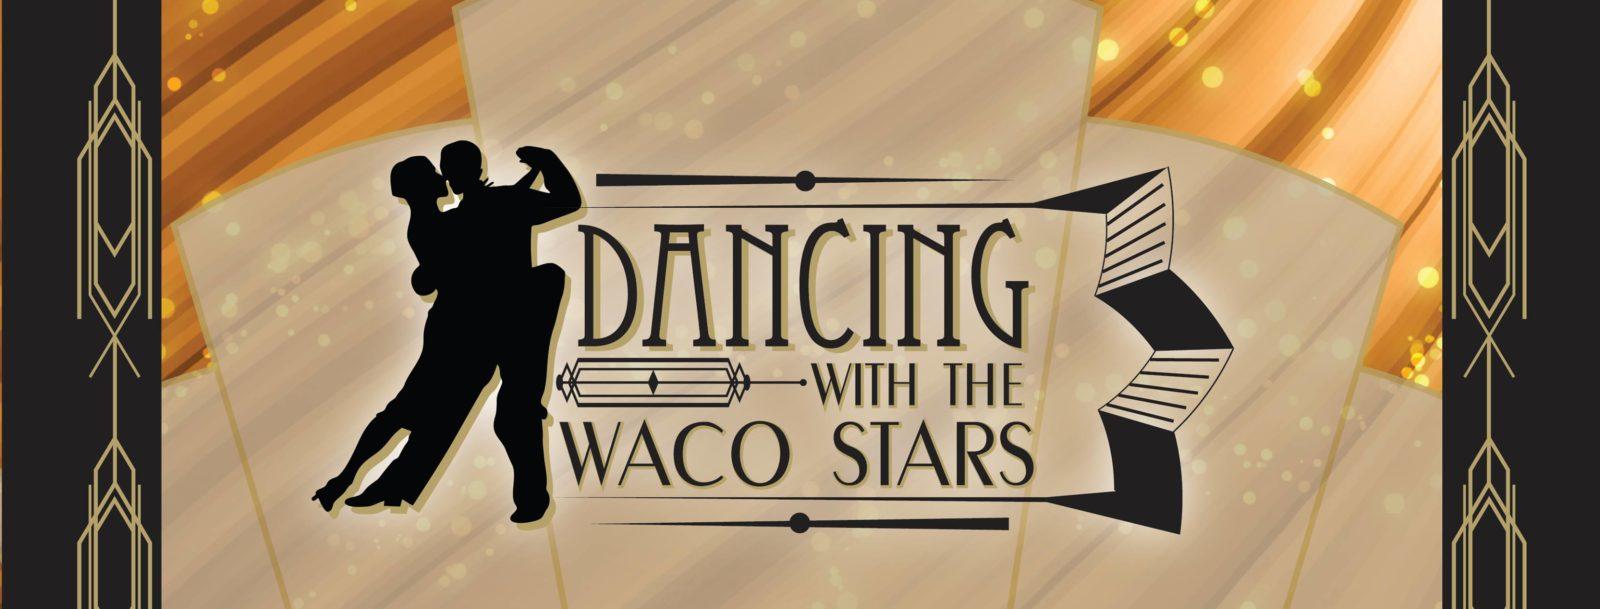 Dancing with the Waco Stars 2019